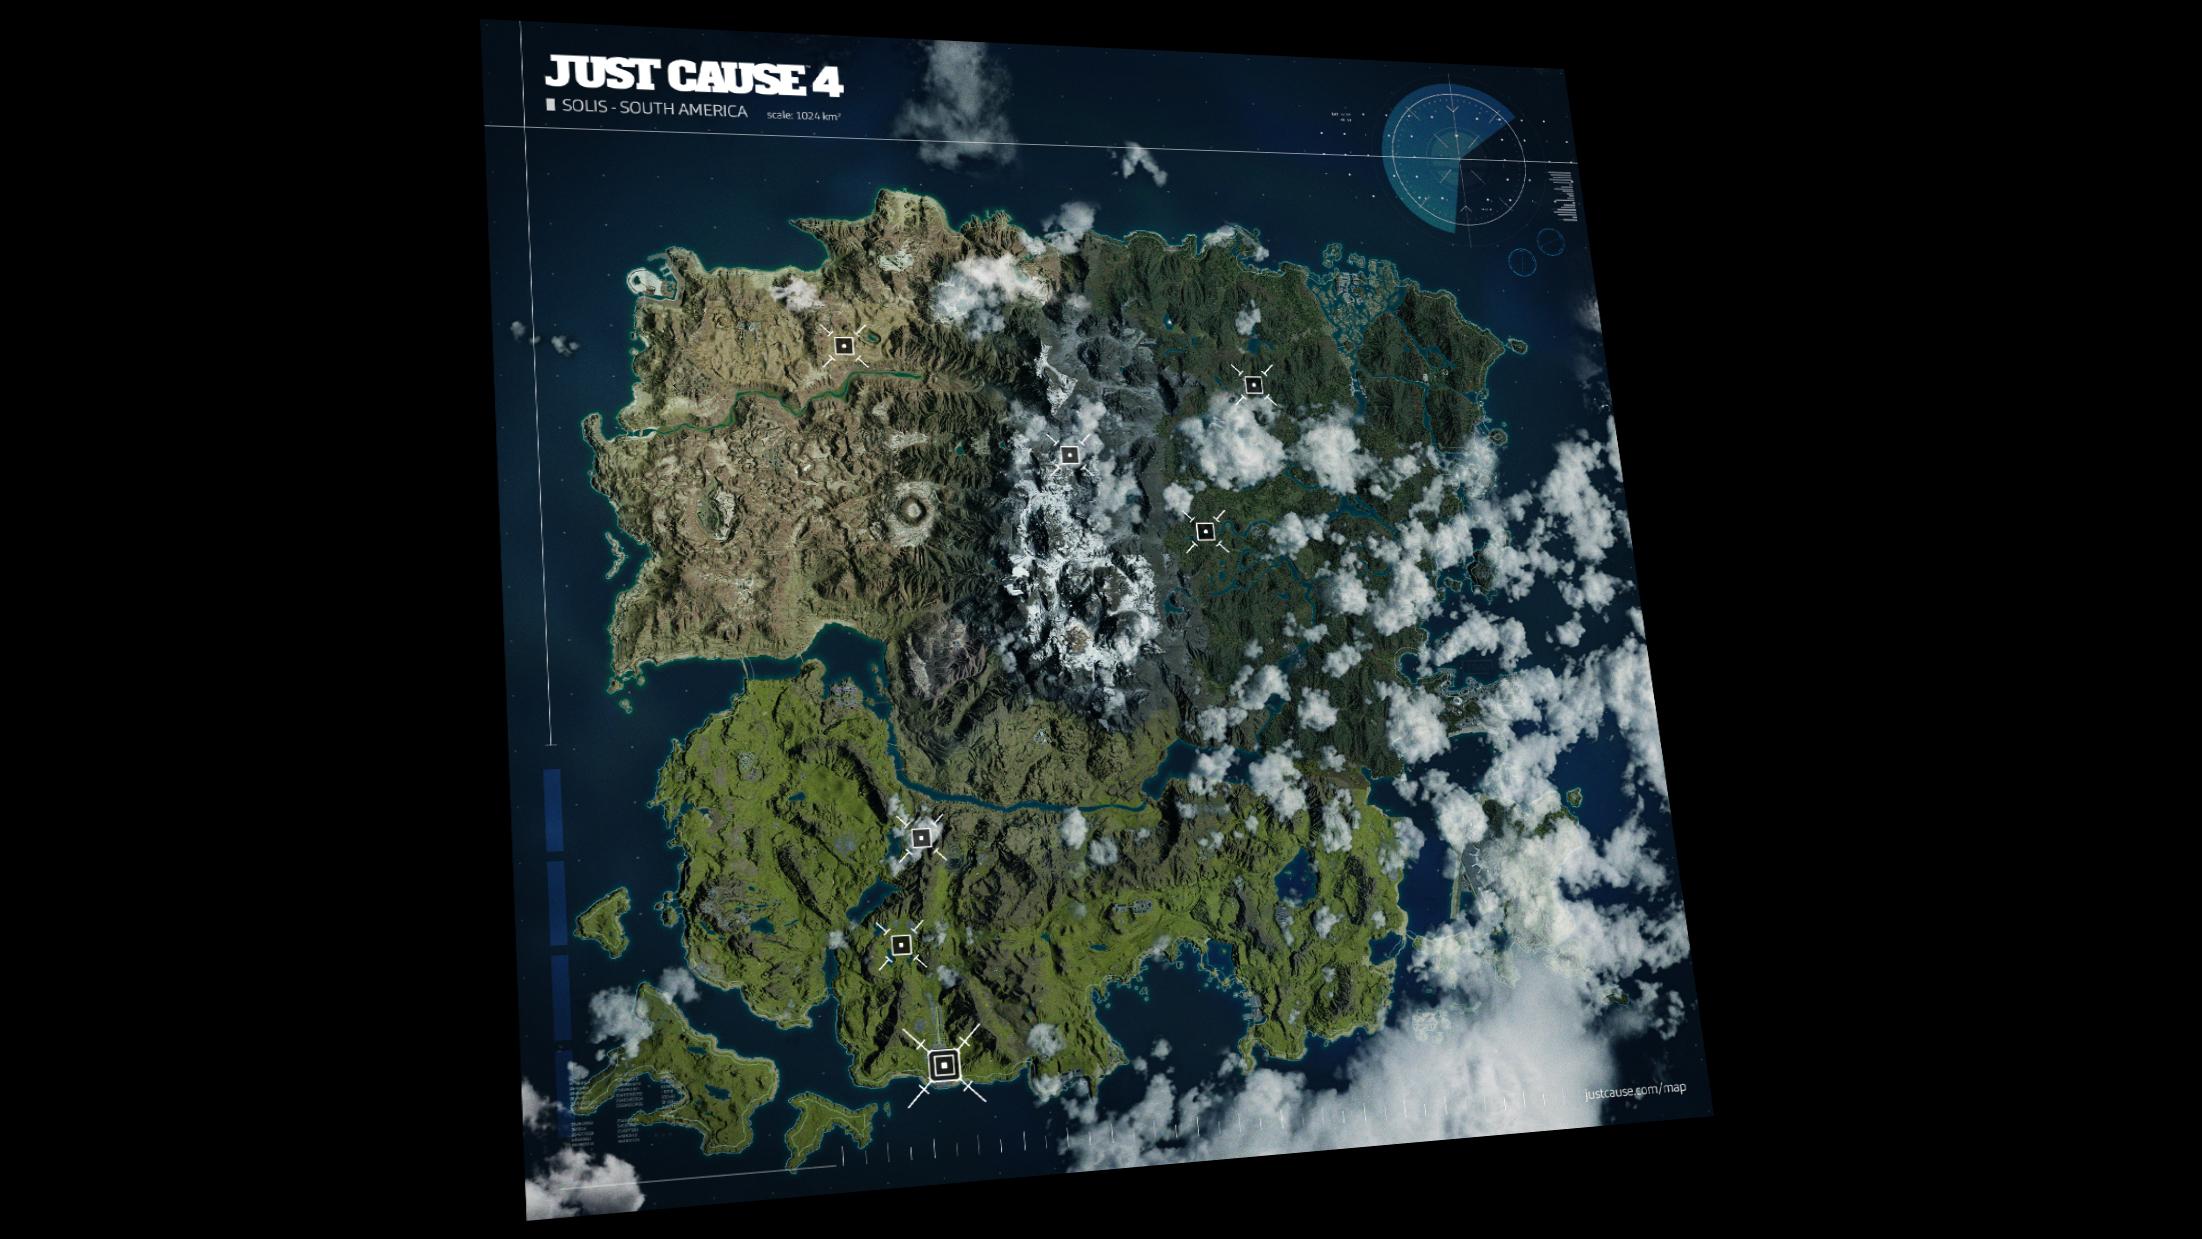 mira-el-mapa-completo-de-just-cause-4-frikigamers.com